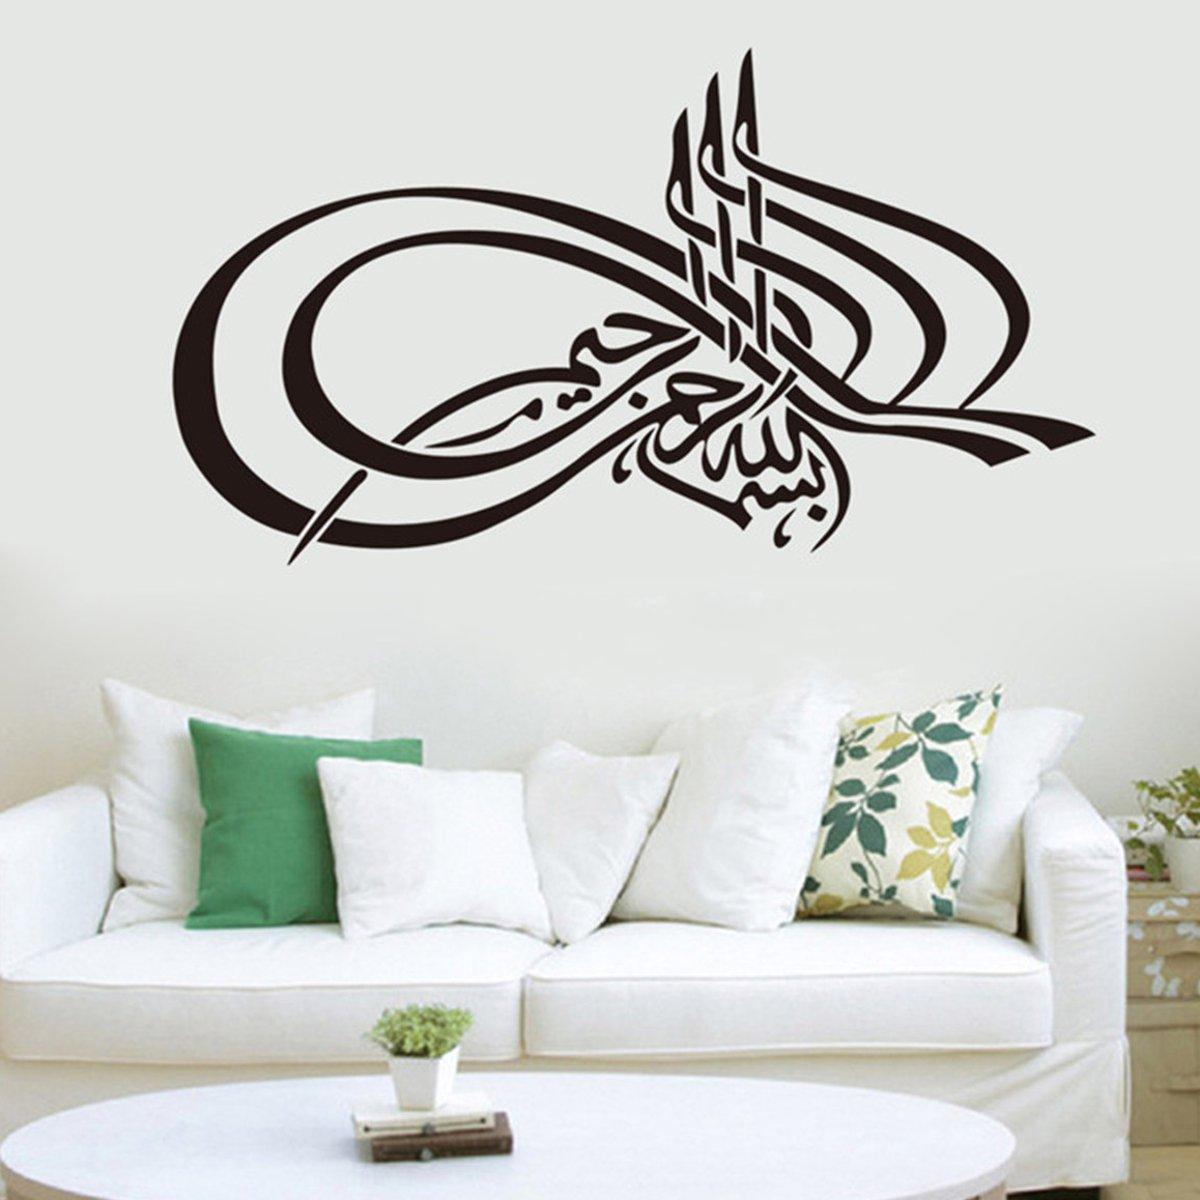 Islamic Vinyl Wall Decor Sticker Dining Kitchen Art Decal